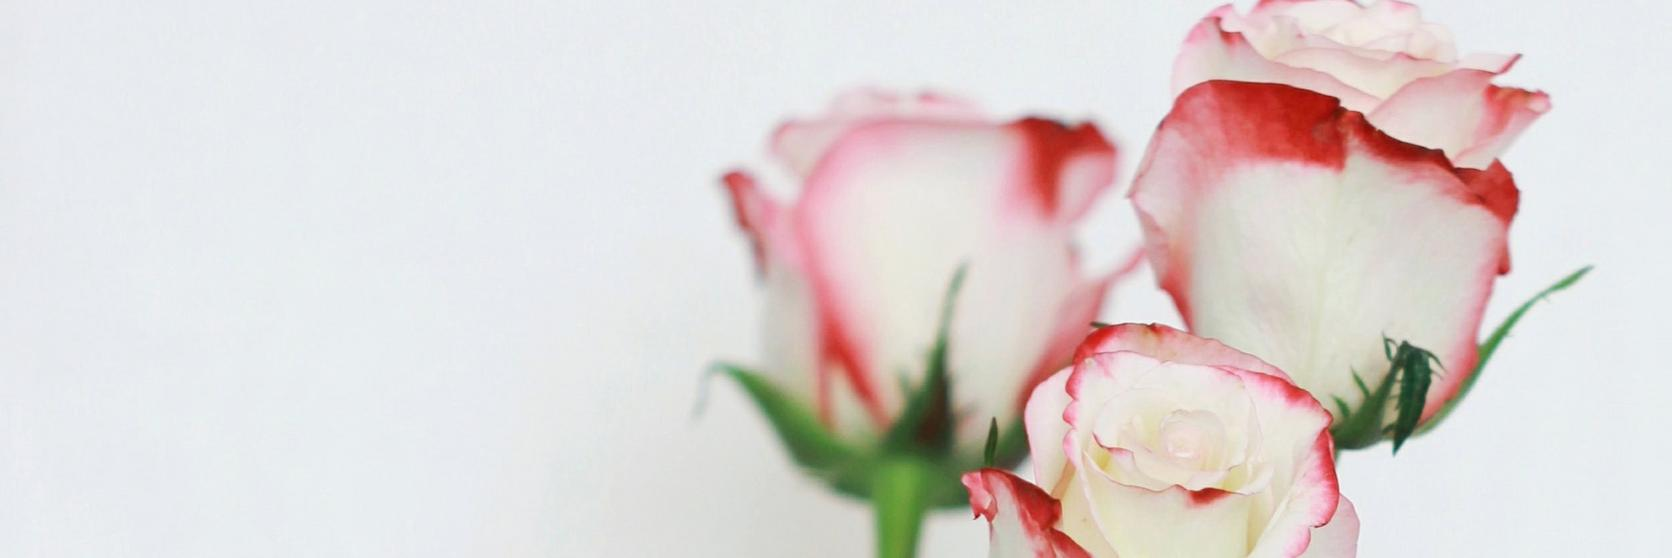 roses-white-pink